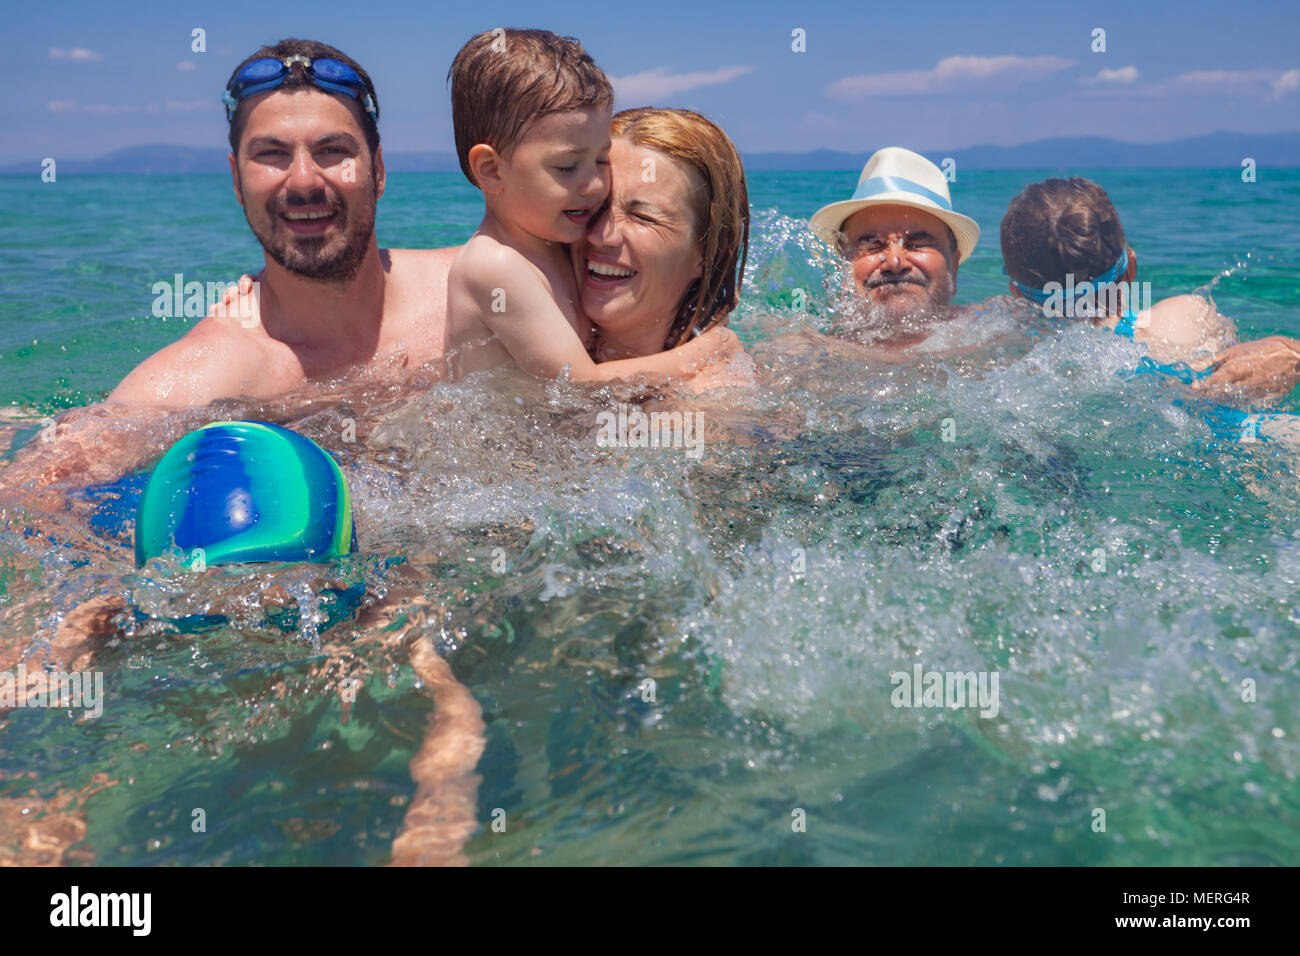 Generations Sea Water Family Happy - Stock Image